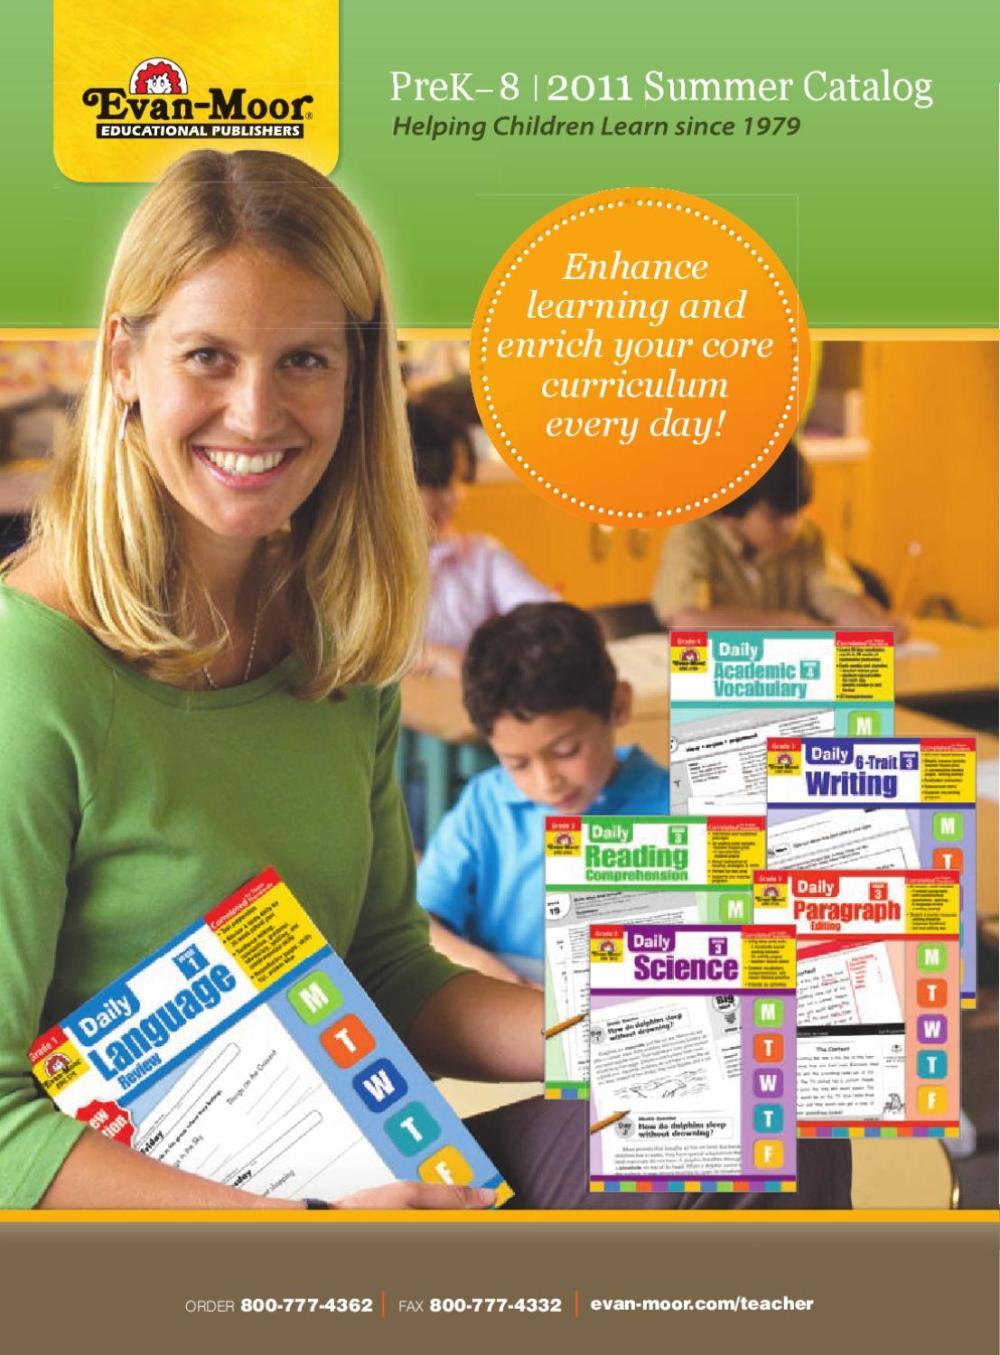 medium resolution of August 2011 Catalog by Evan-Moor Educational Publishers - issuu